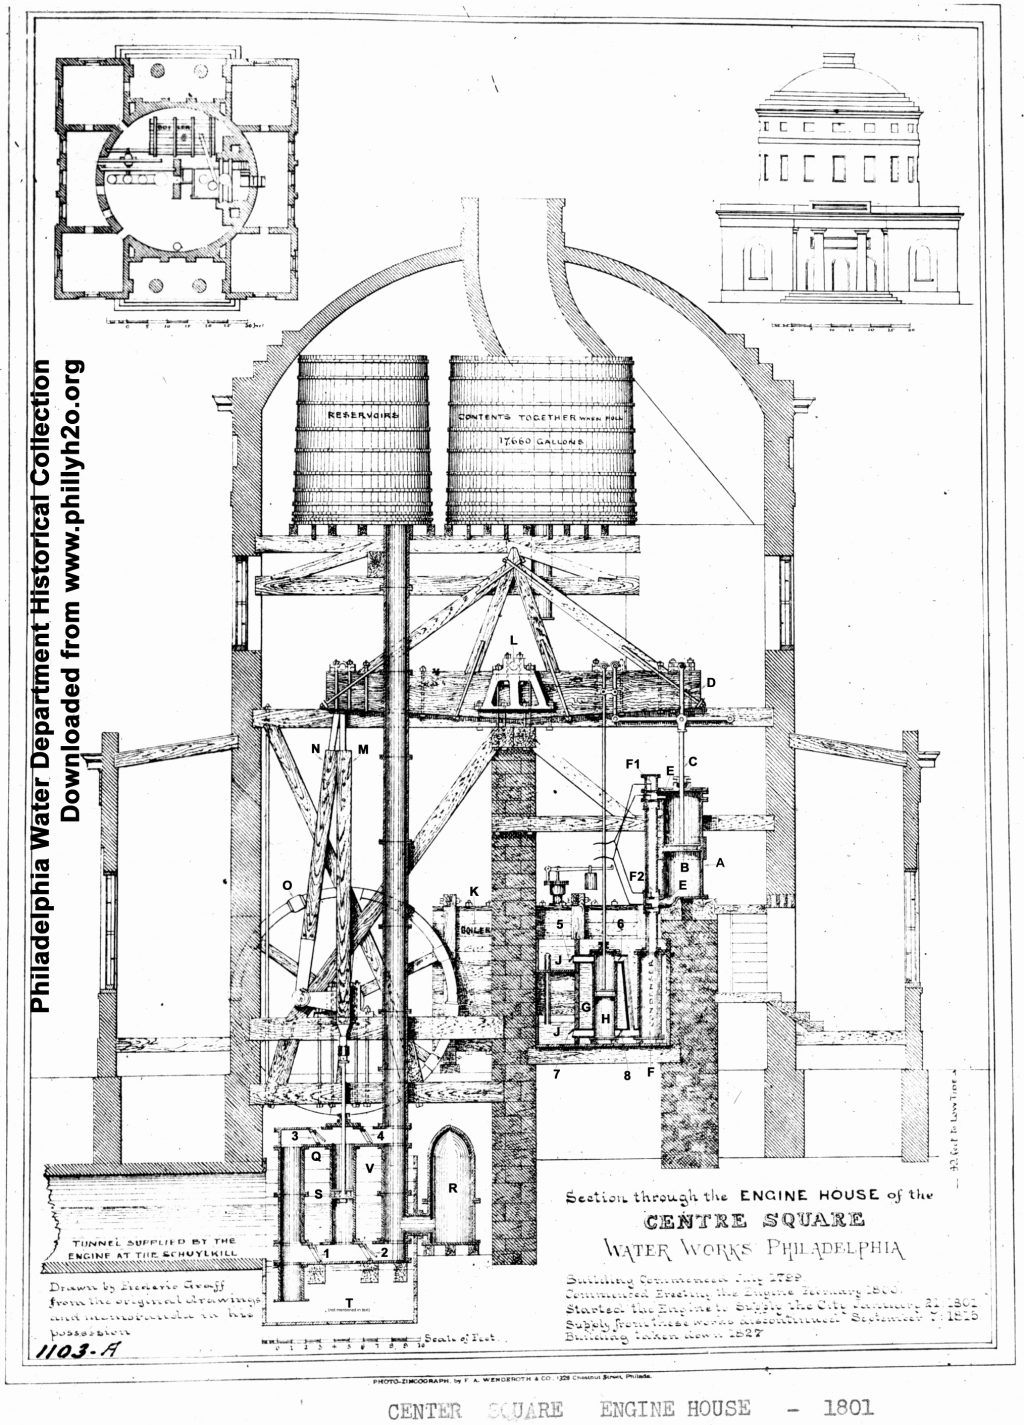 Lift Station Design Spreadsheet In Pump Station Design Spreadsheet Inspirational  Pywrapper